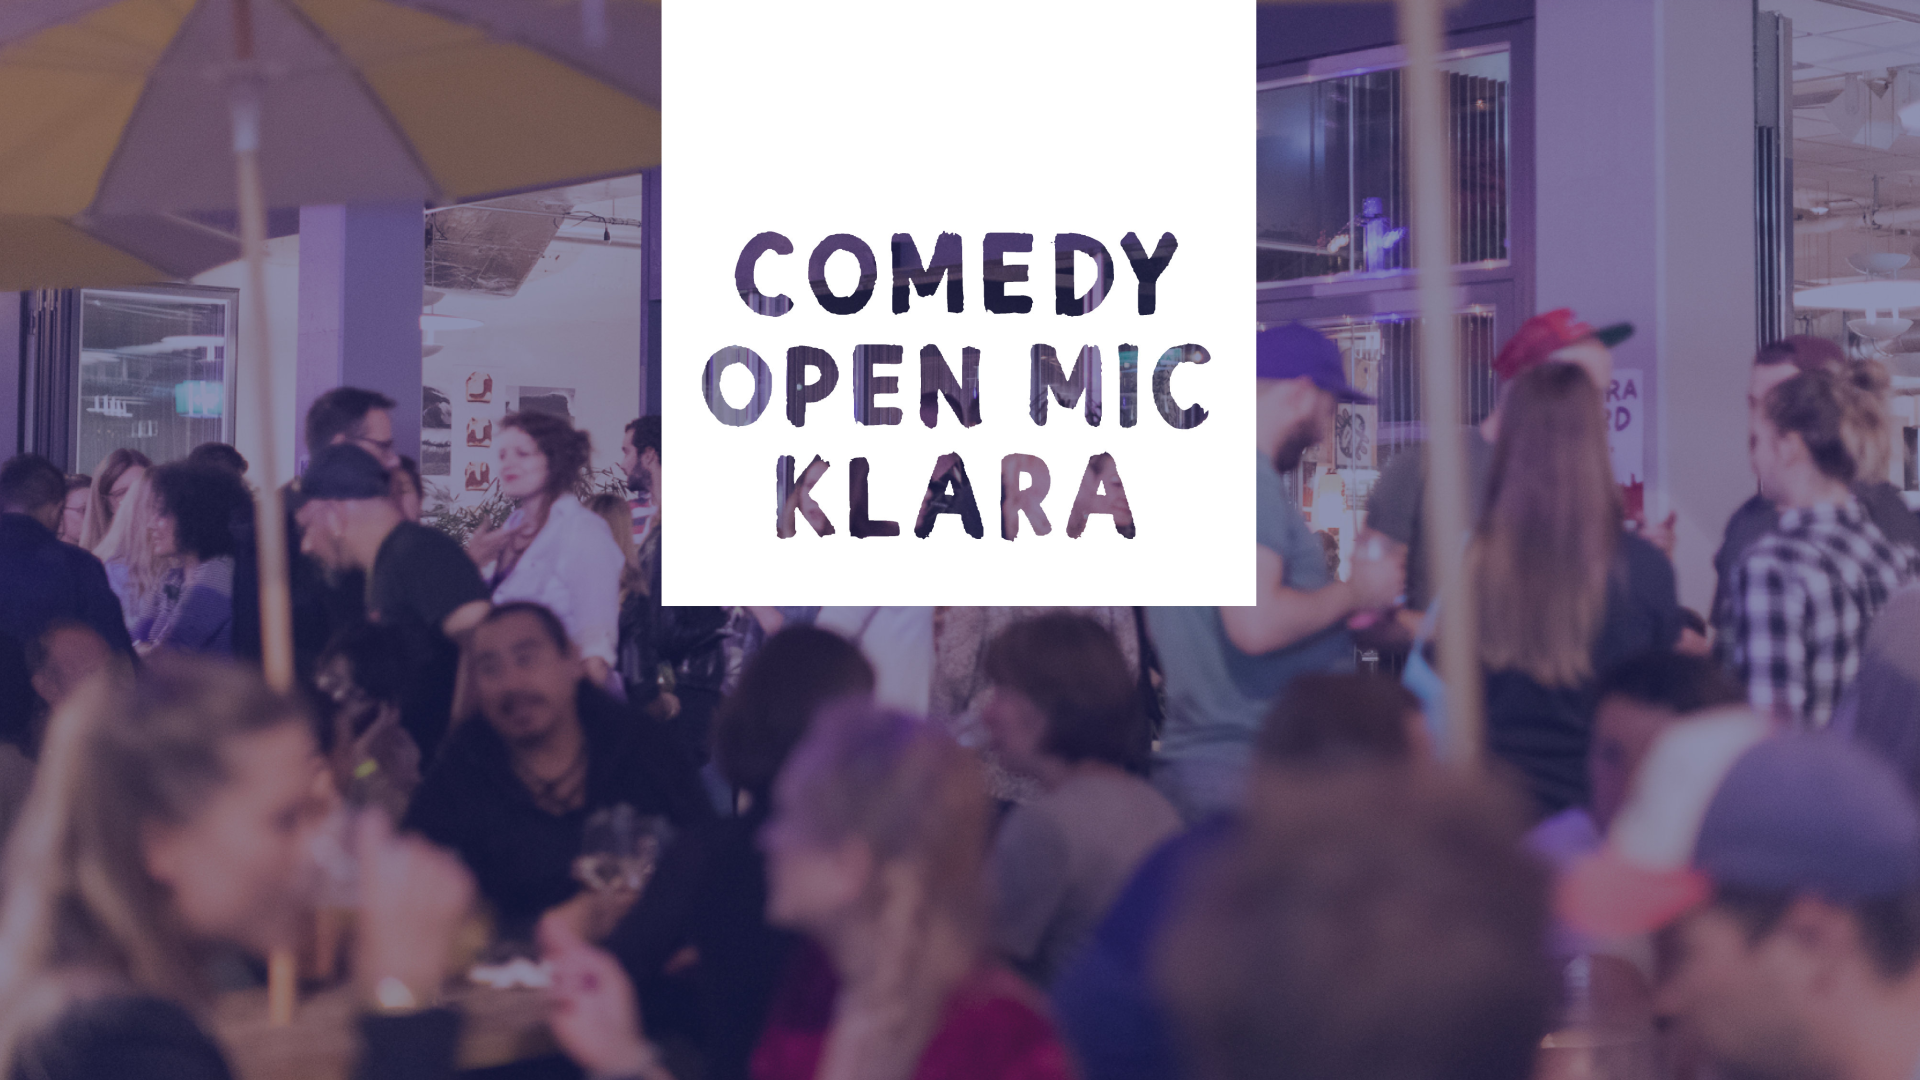 Comedy Open Mic at Klara event cover image